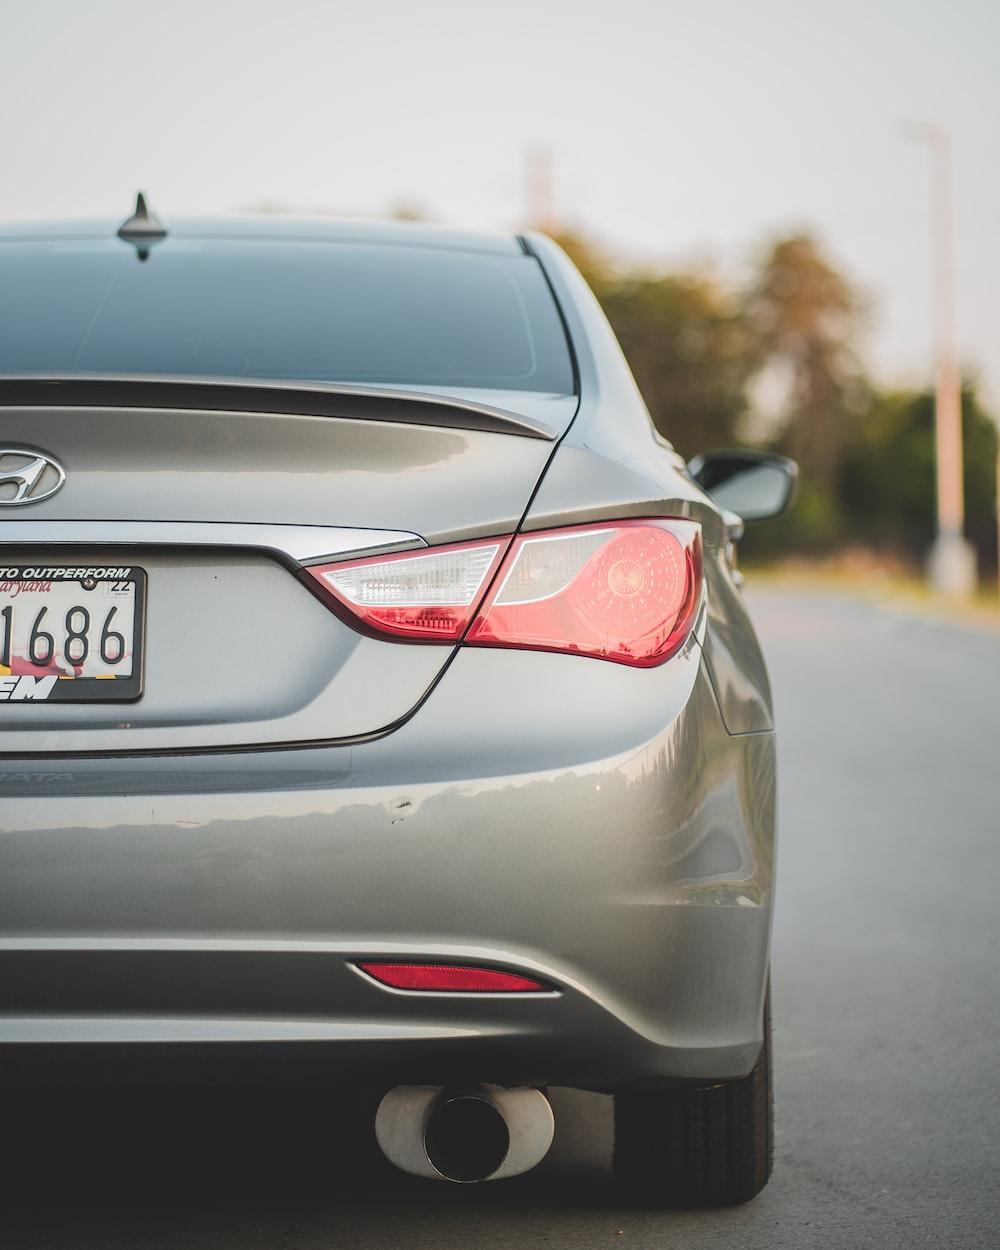 gray honda car on road during daytime